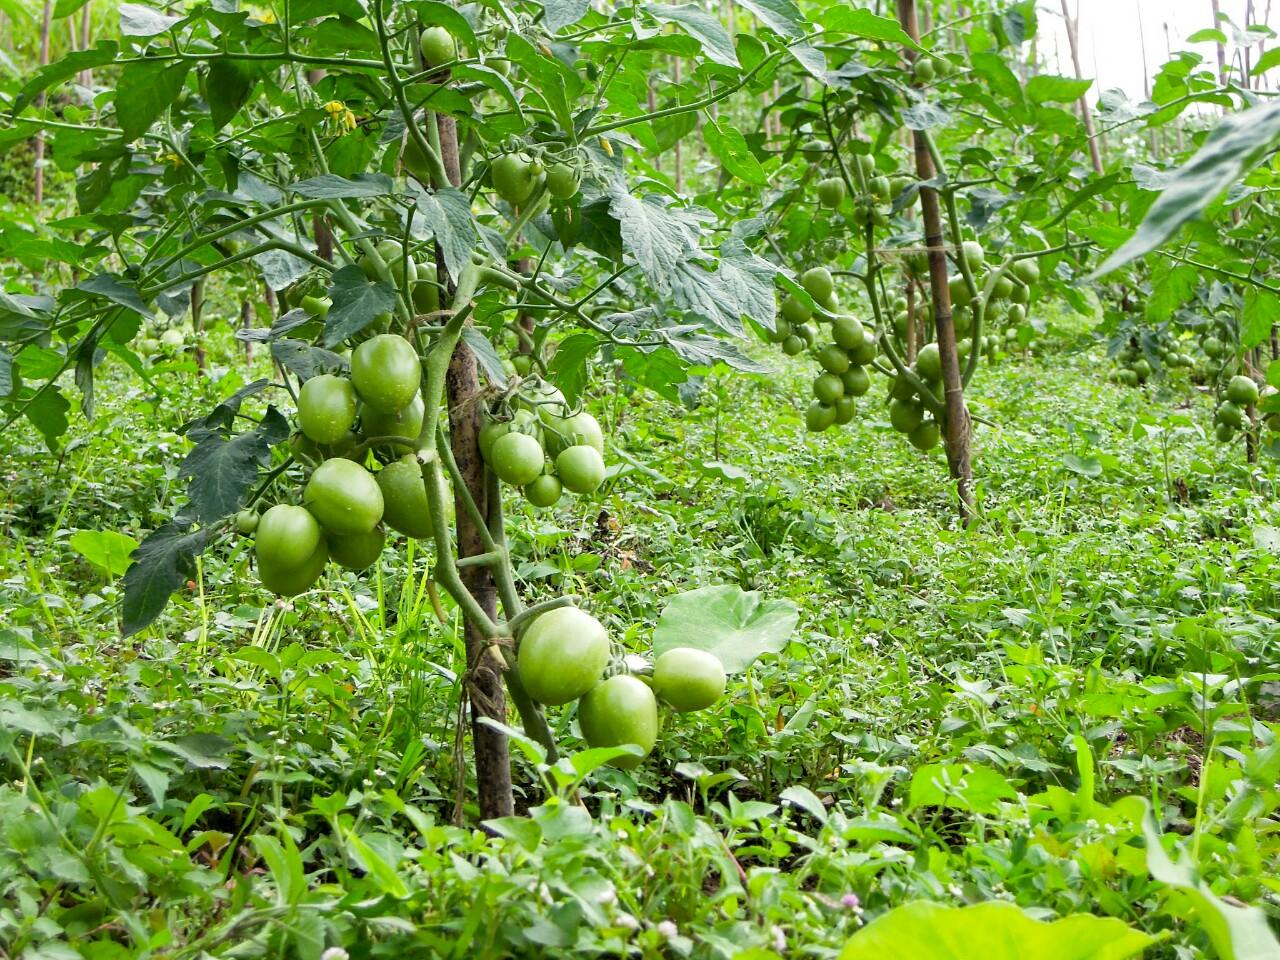 freiland tomaten in upper bhaluthang c reinhard gessl. Black Bedroom Furniture Sets. Home Design Ideas